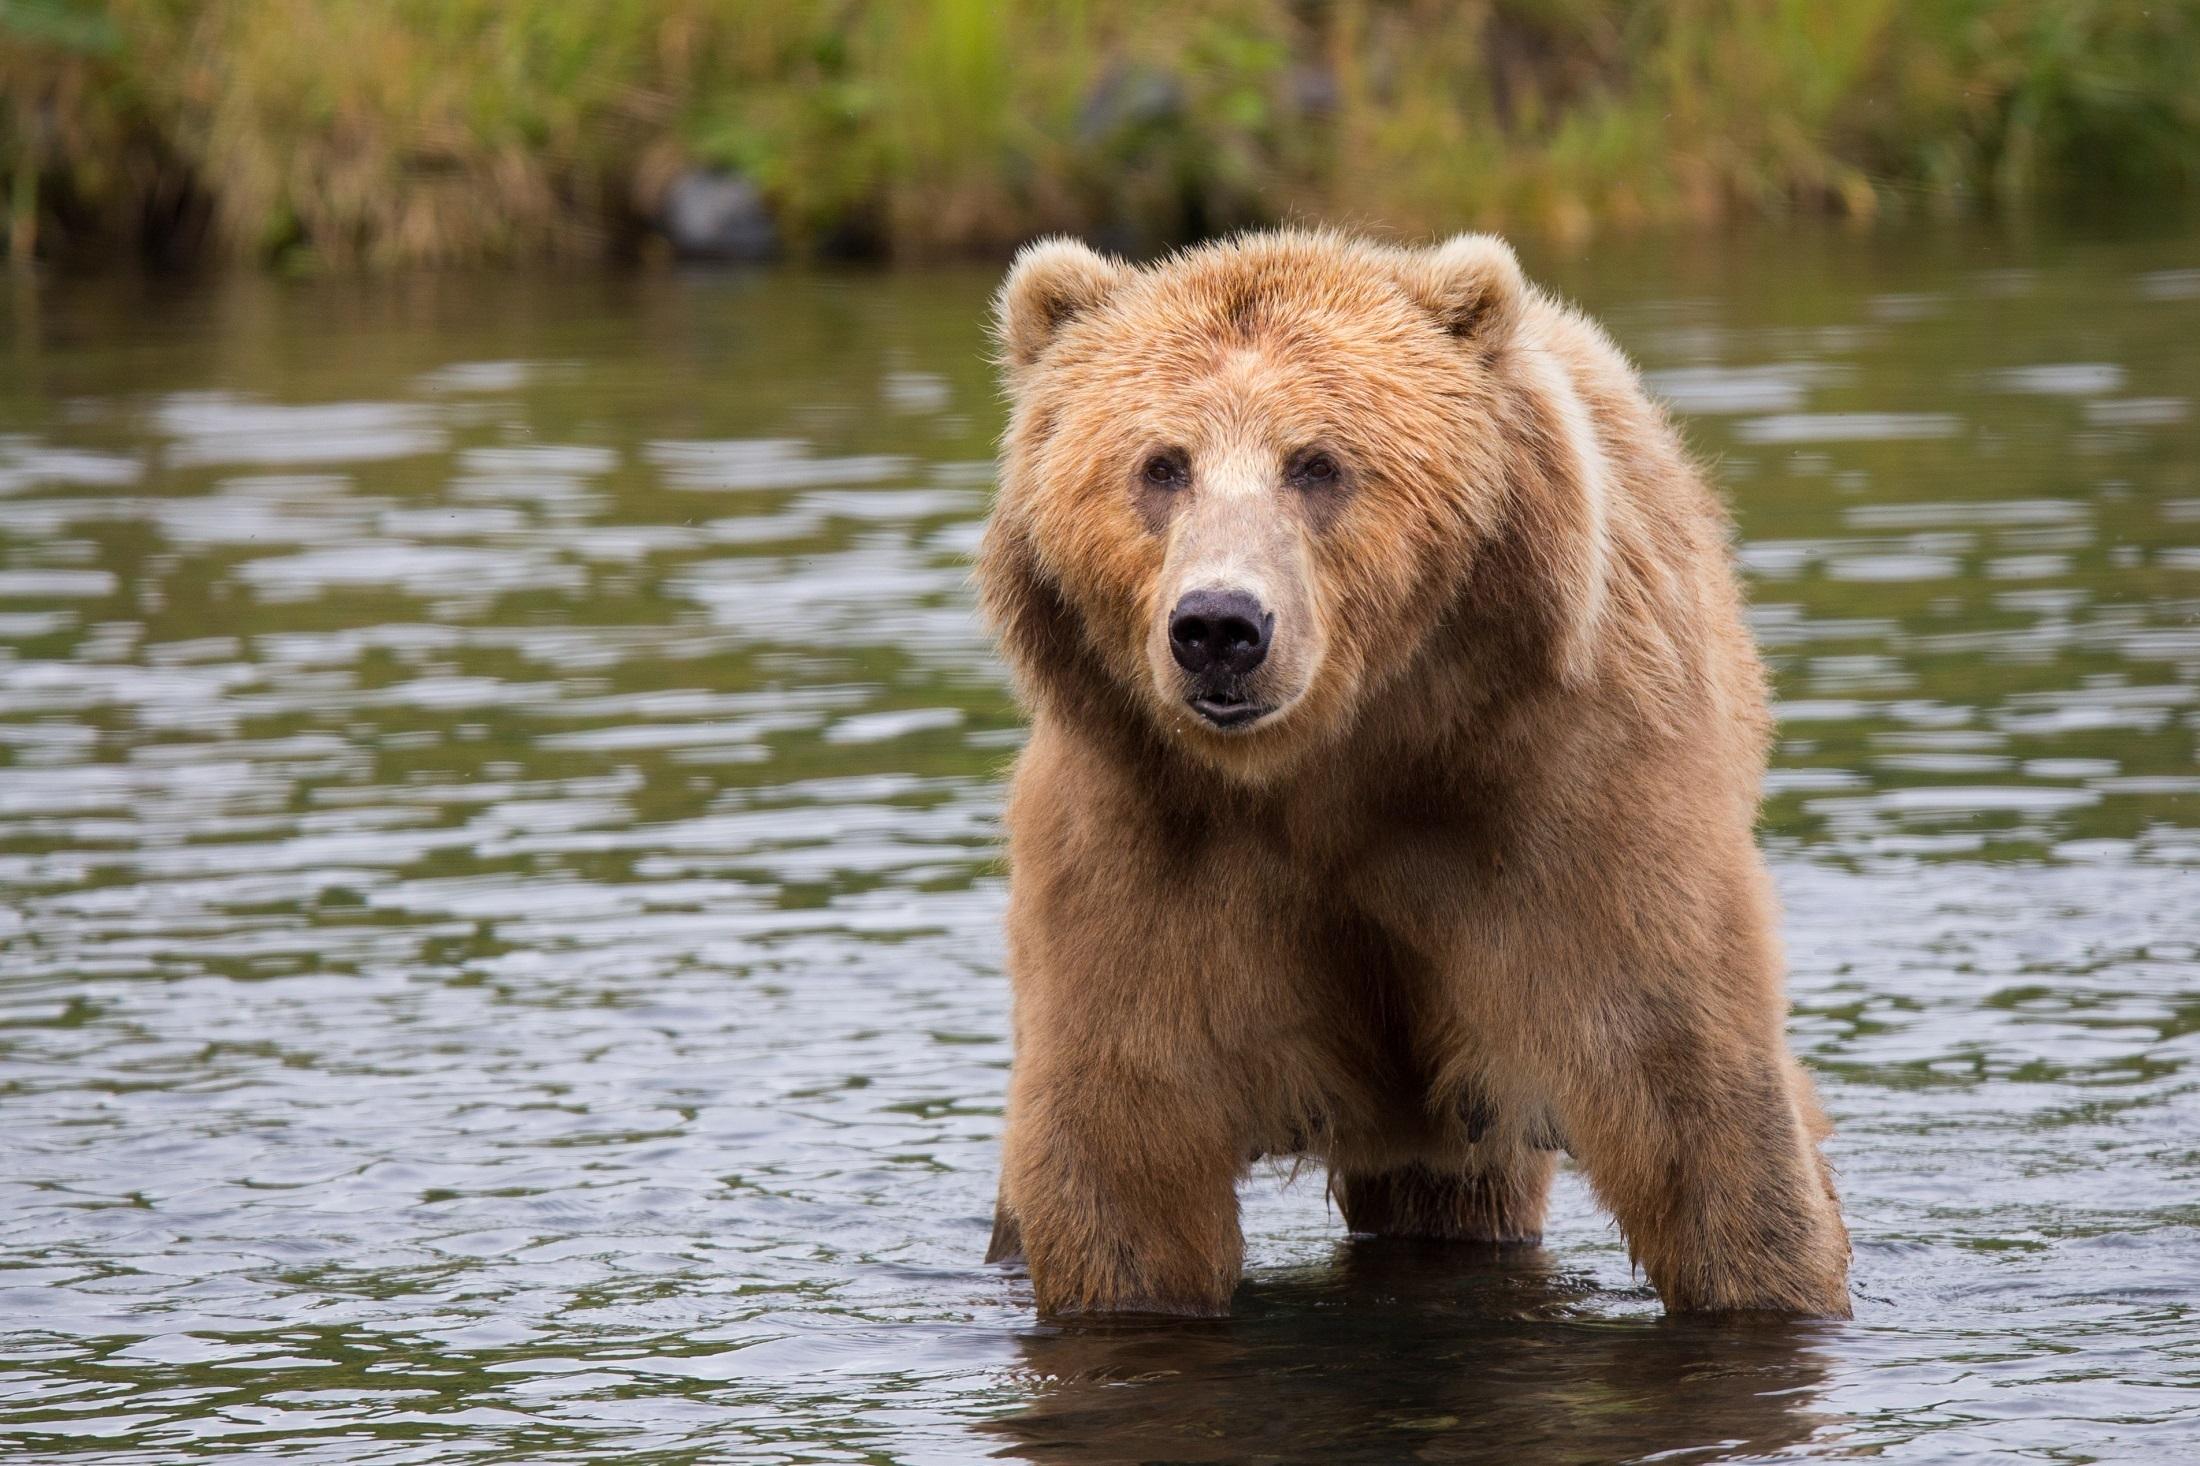 kodiak-brown-bear-adult-portrait-wildlife-158109